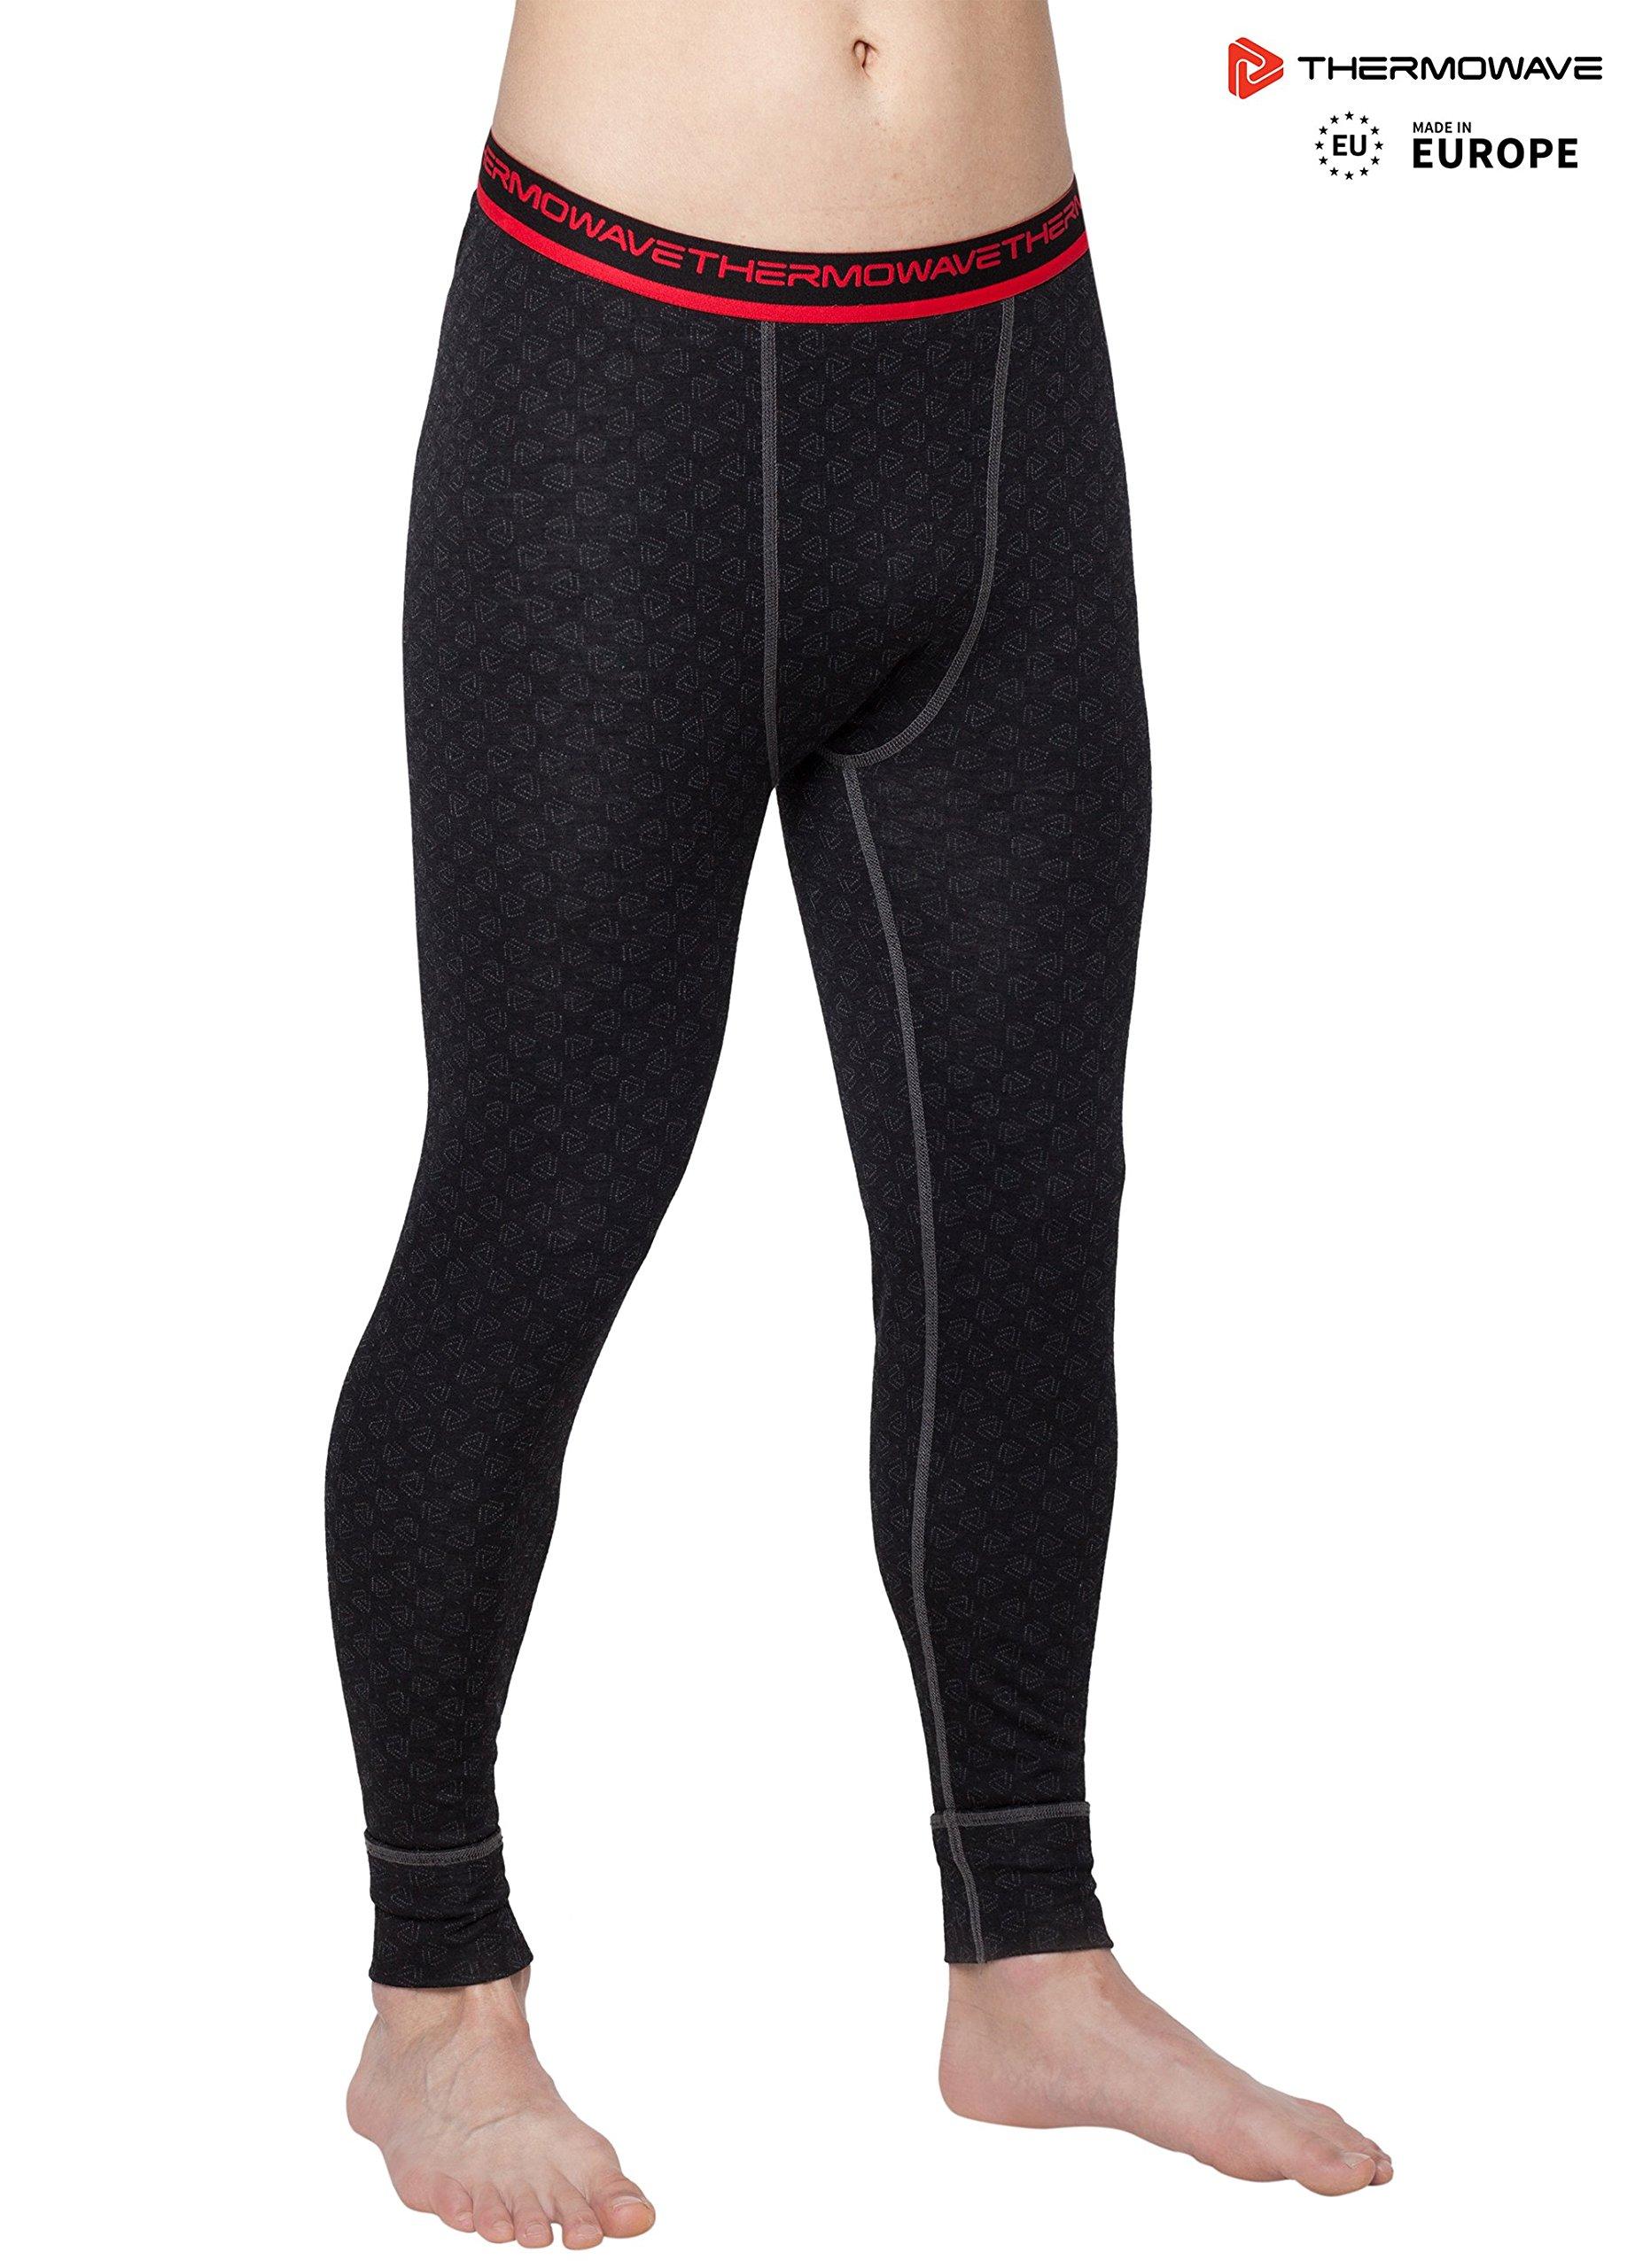 Thermowave - Merino Xtreme/Mens Merino Wool Thermal Pants/Black - Small